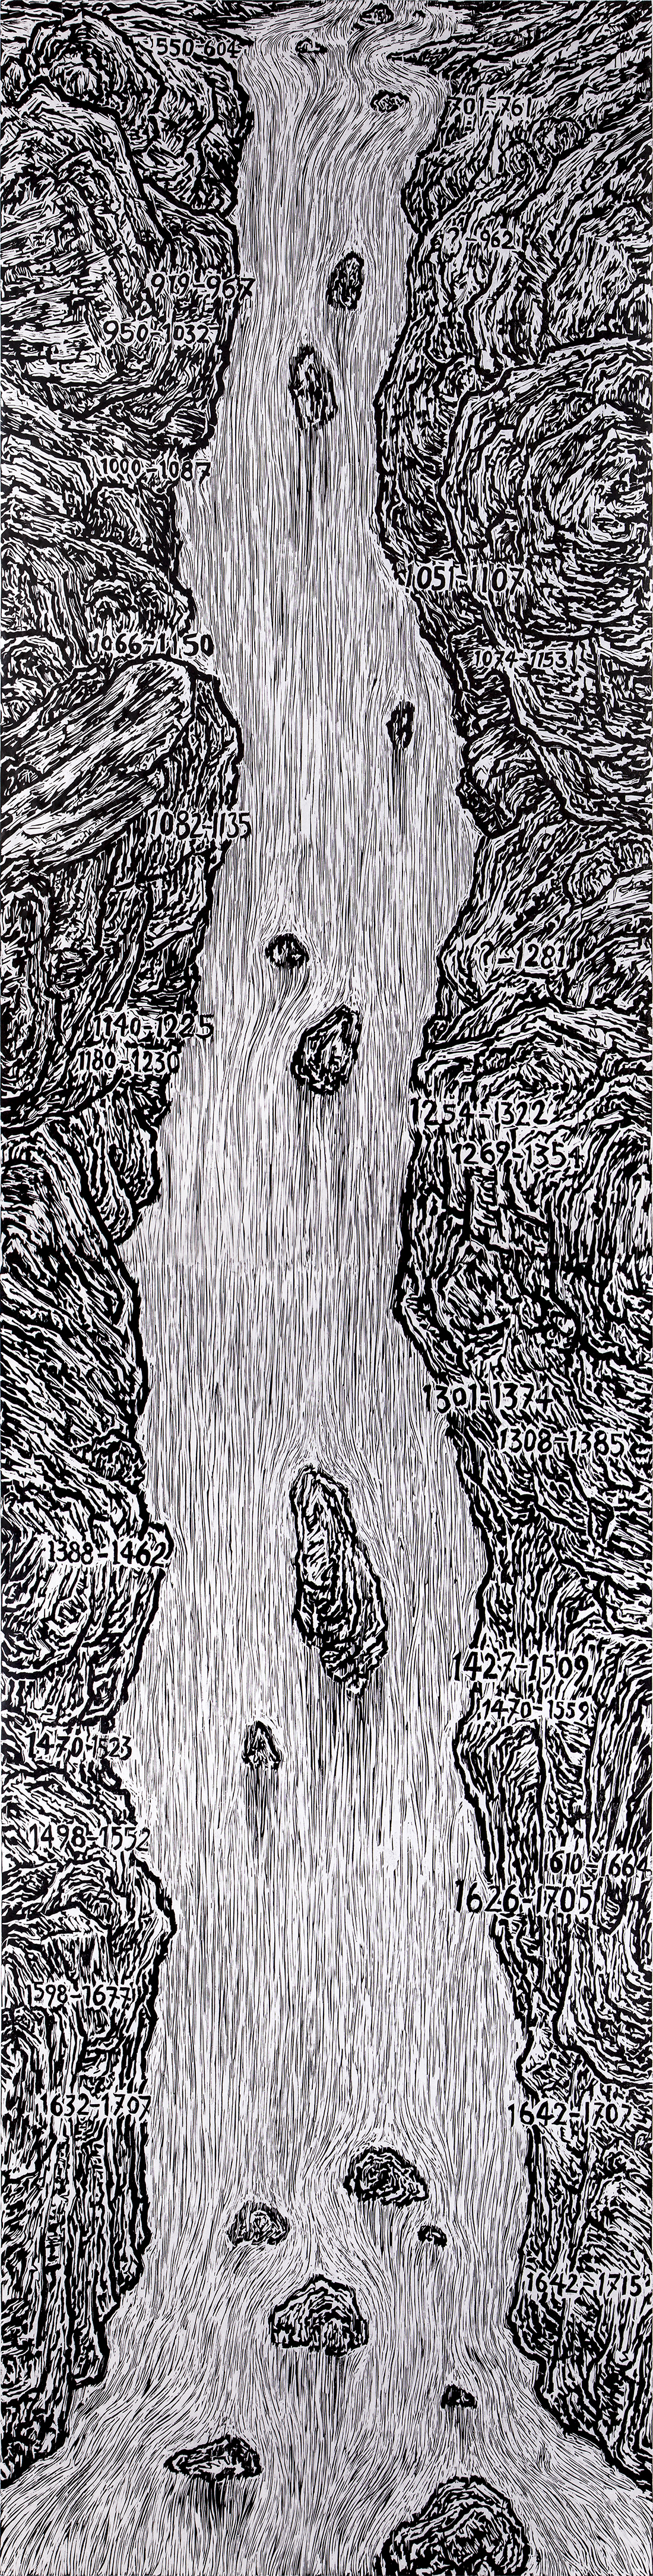 Ni Youyi 倪有鱼, View of History 历史观, 2014, Woodcut on hand-made paper 木刻, 纸本手工拓印, 365 x 90 cm